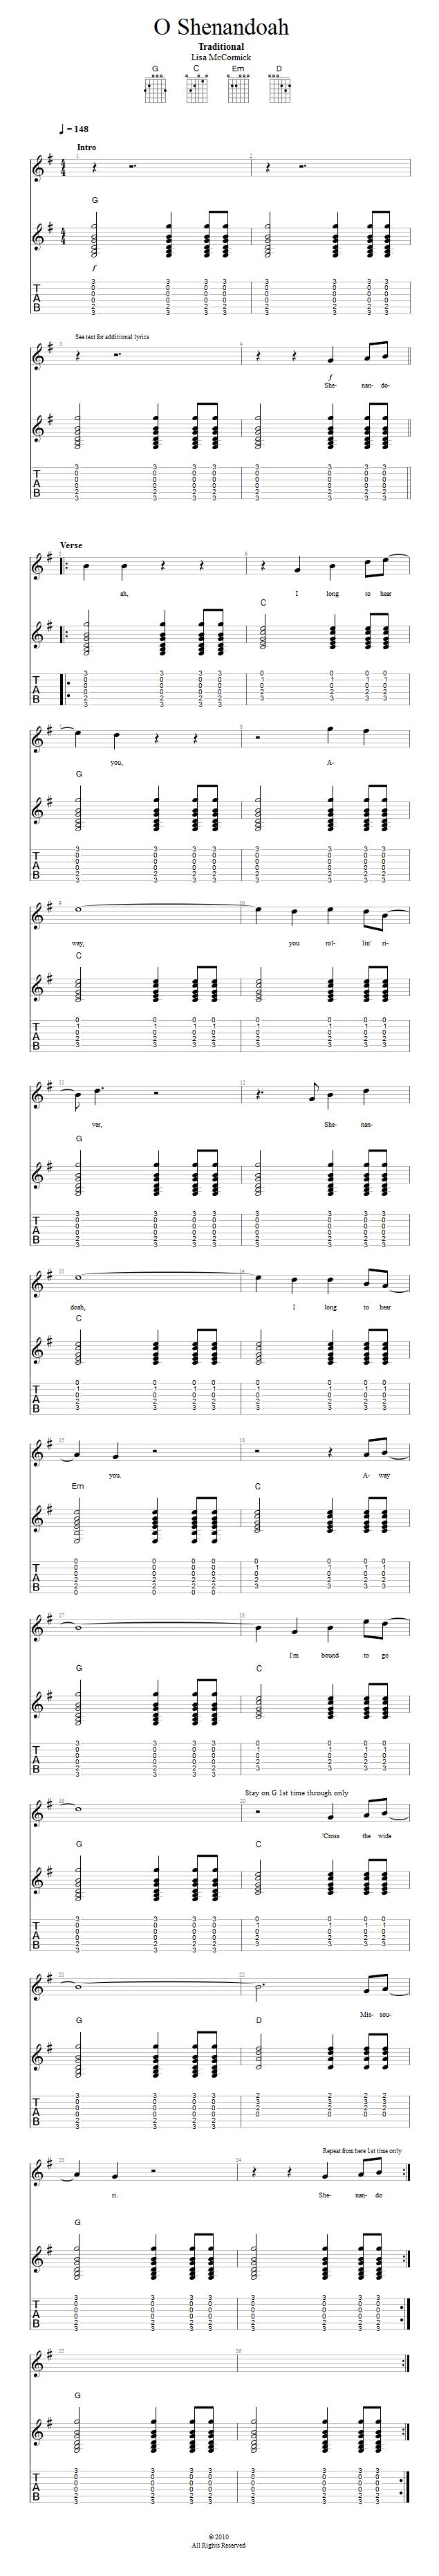 Guitar Lessons O Shenandoah Song To Play